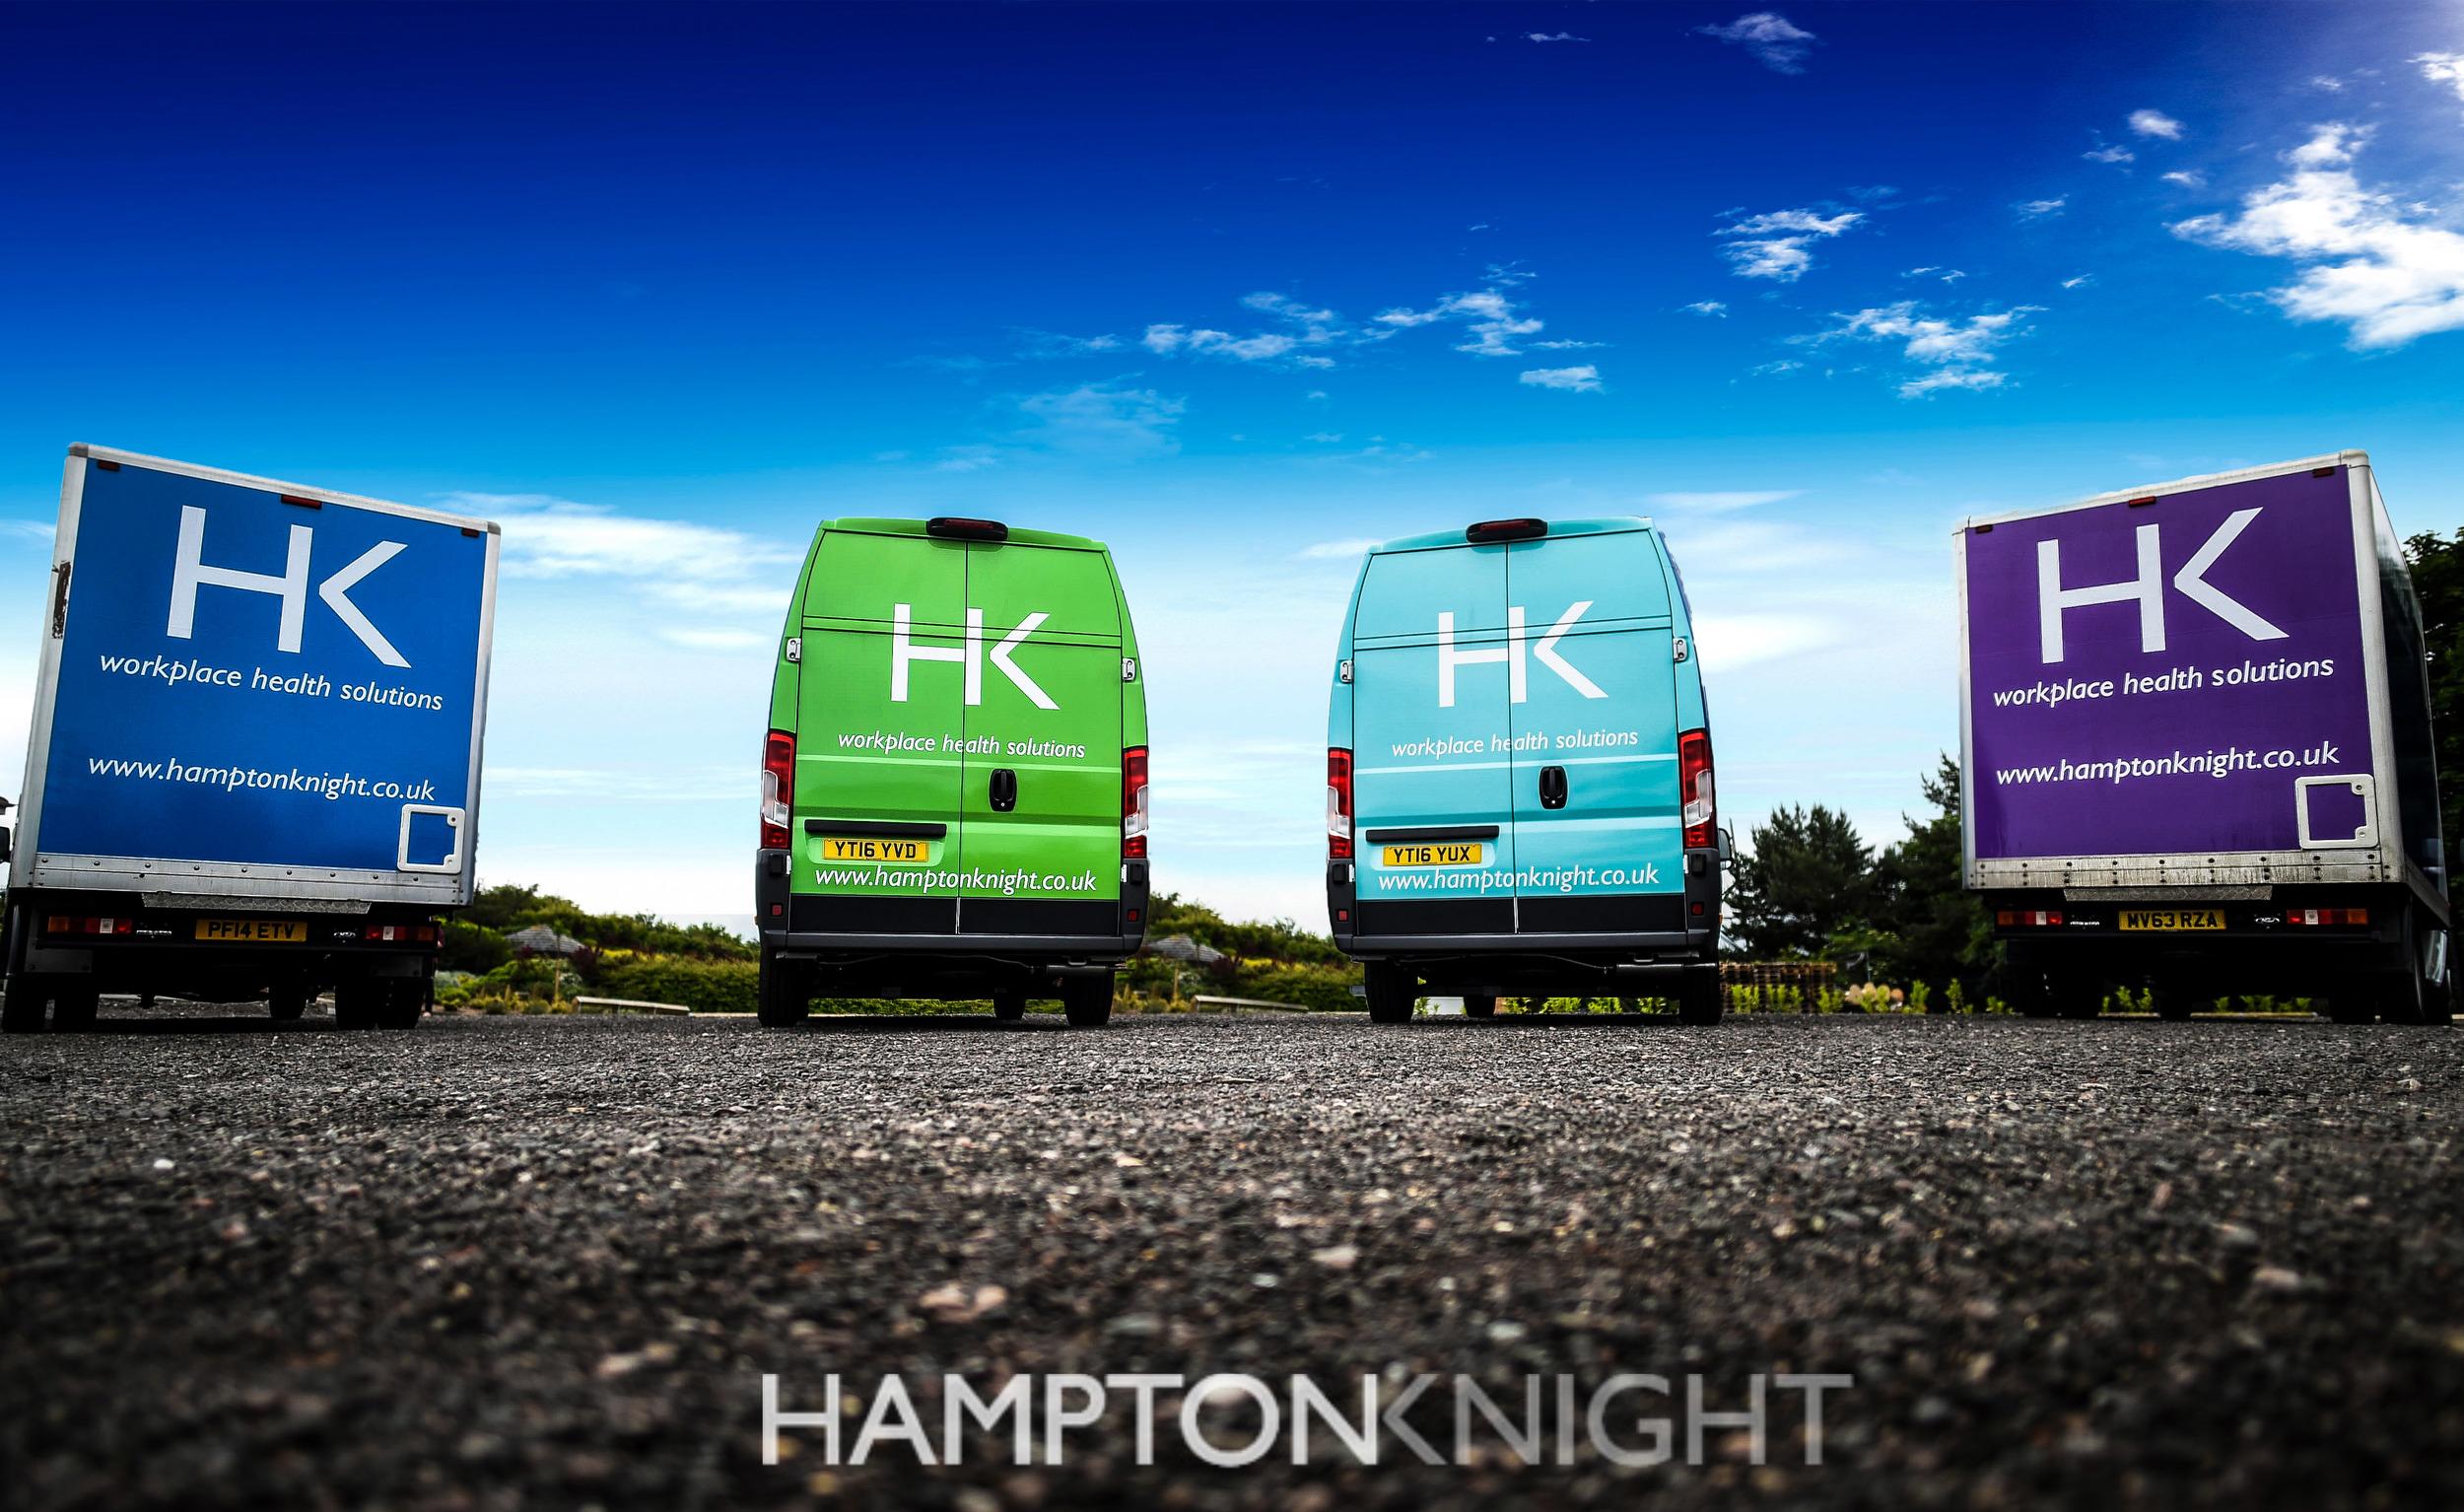 hampton knight3-1-2best.jpg